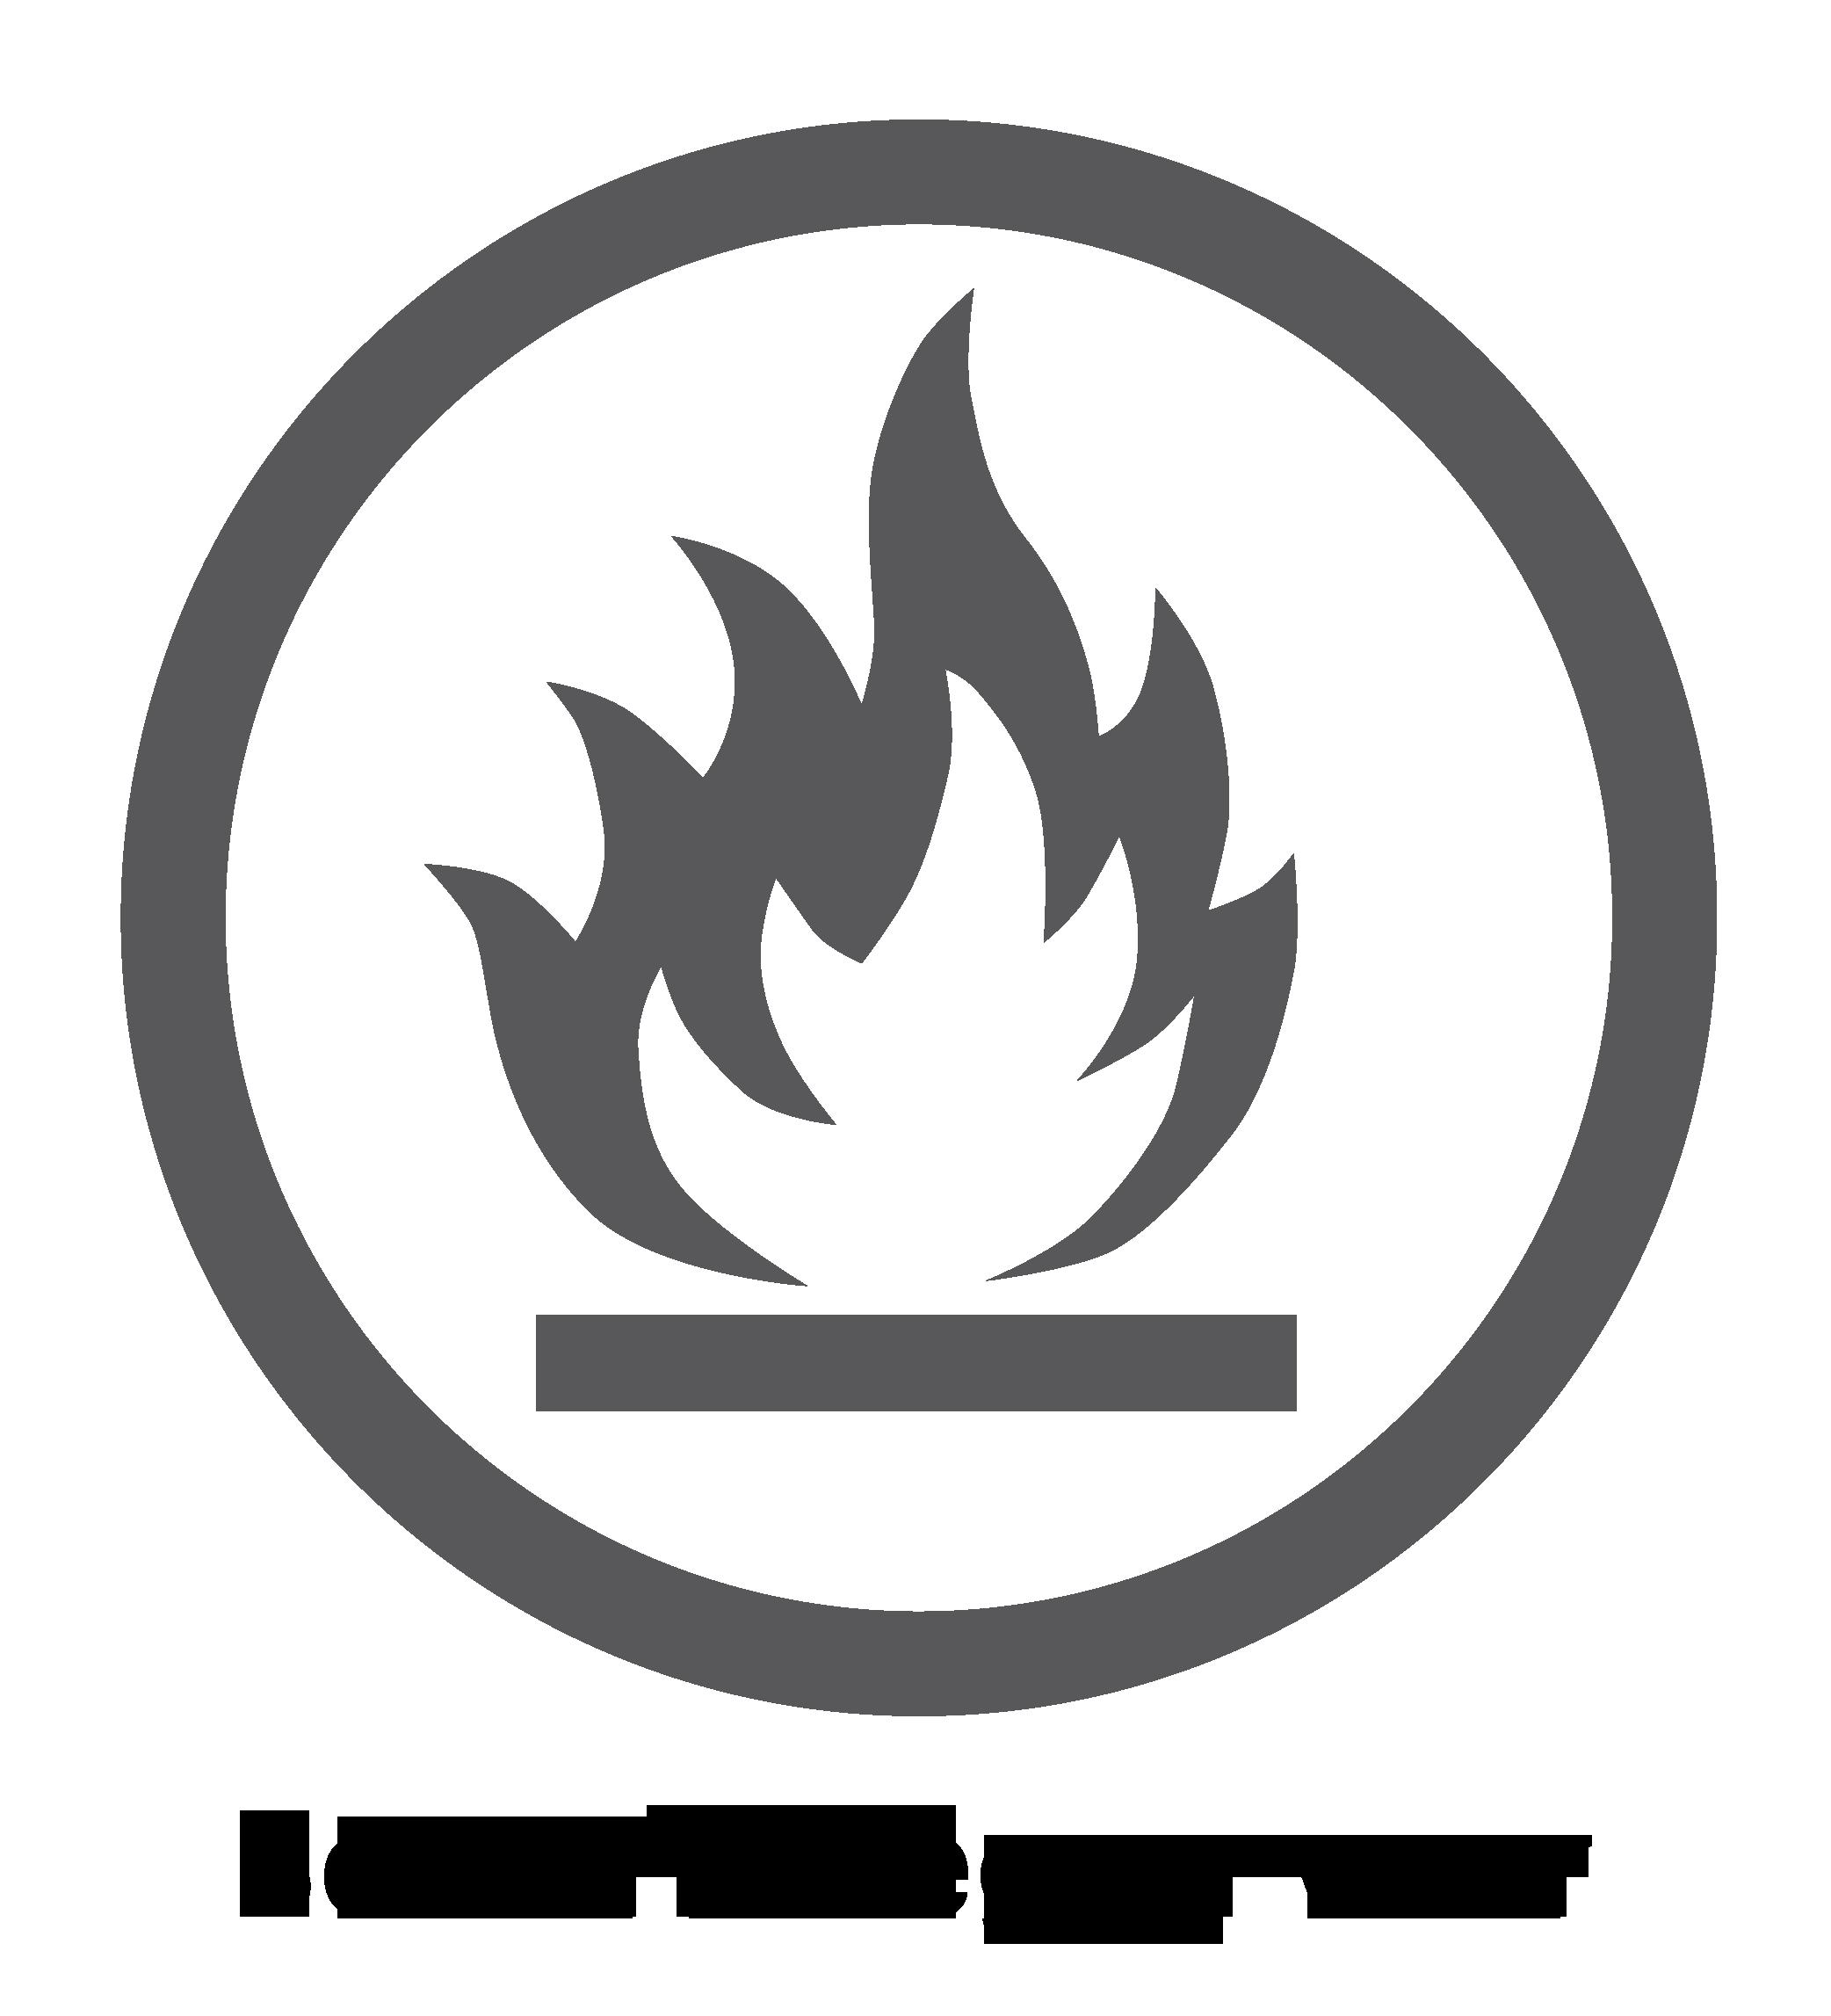 Logo van brandwerend oppervlak